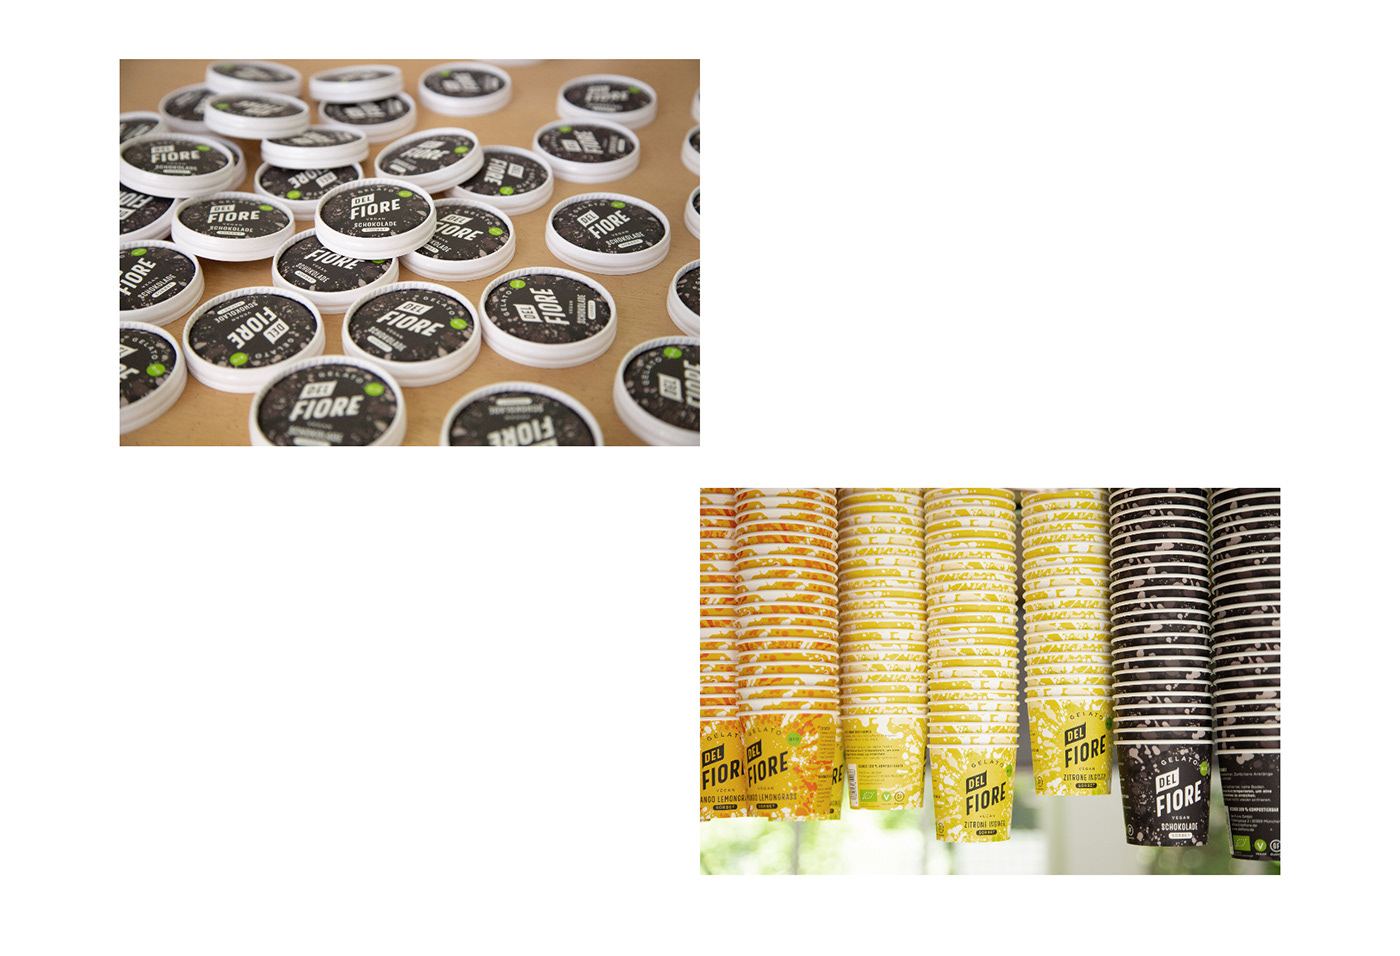 ArtDirection concept corporatedeisgn design Keyvisual logodesign Packaging packagingdesign UxUIdesign Webdesign